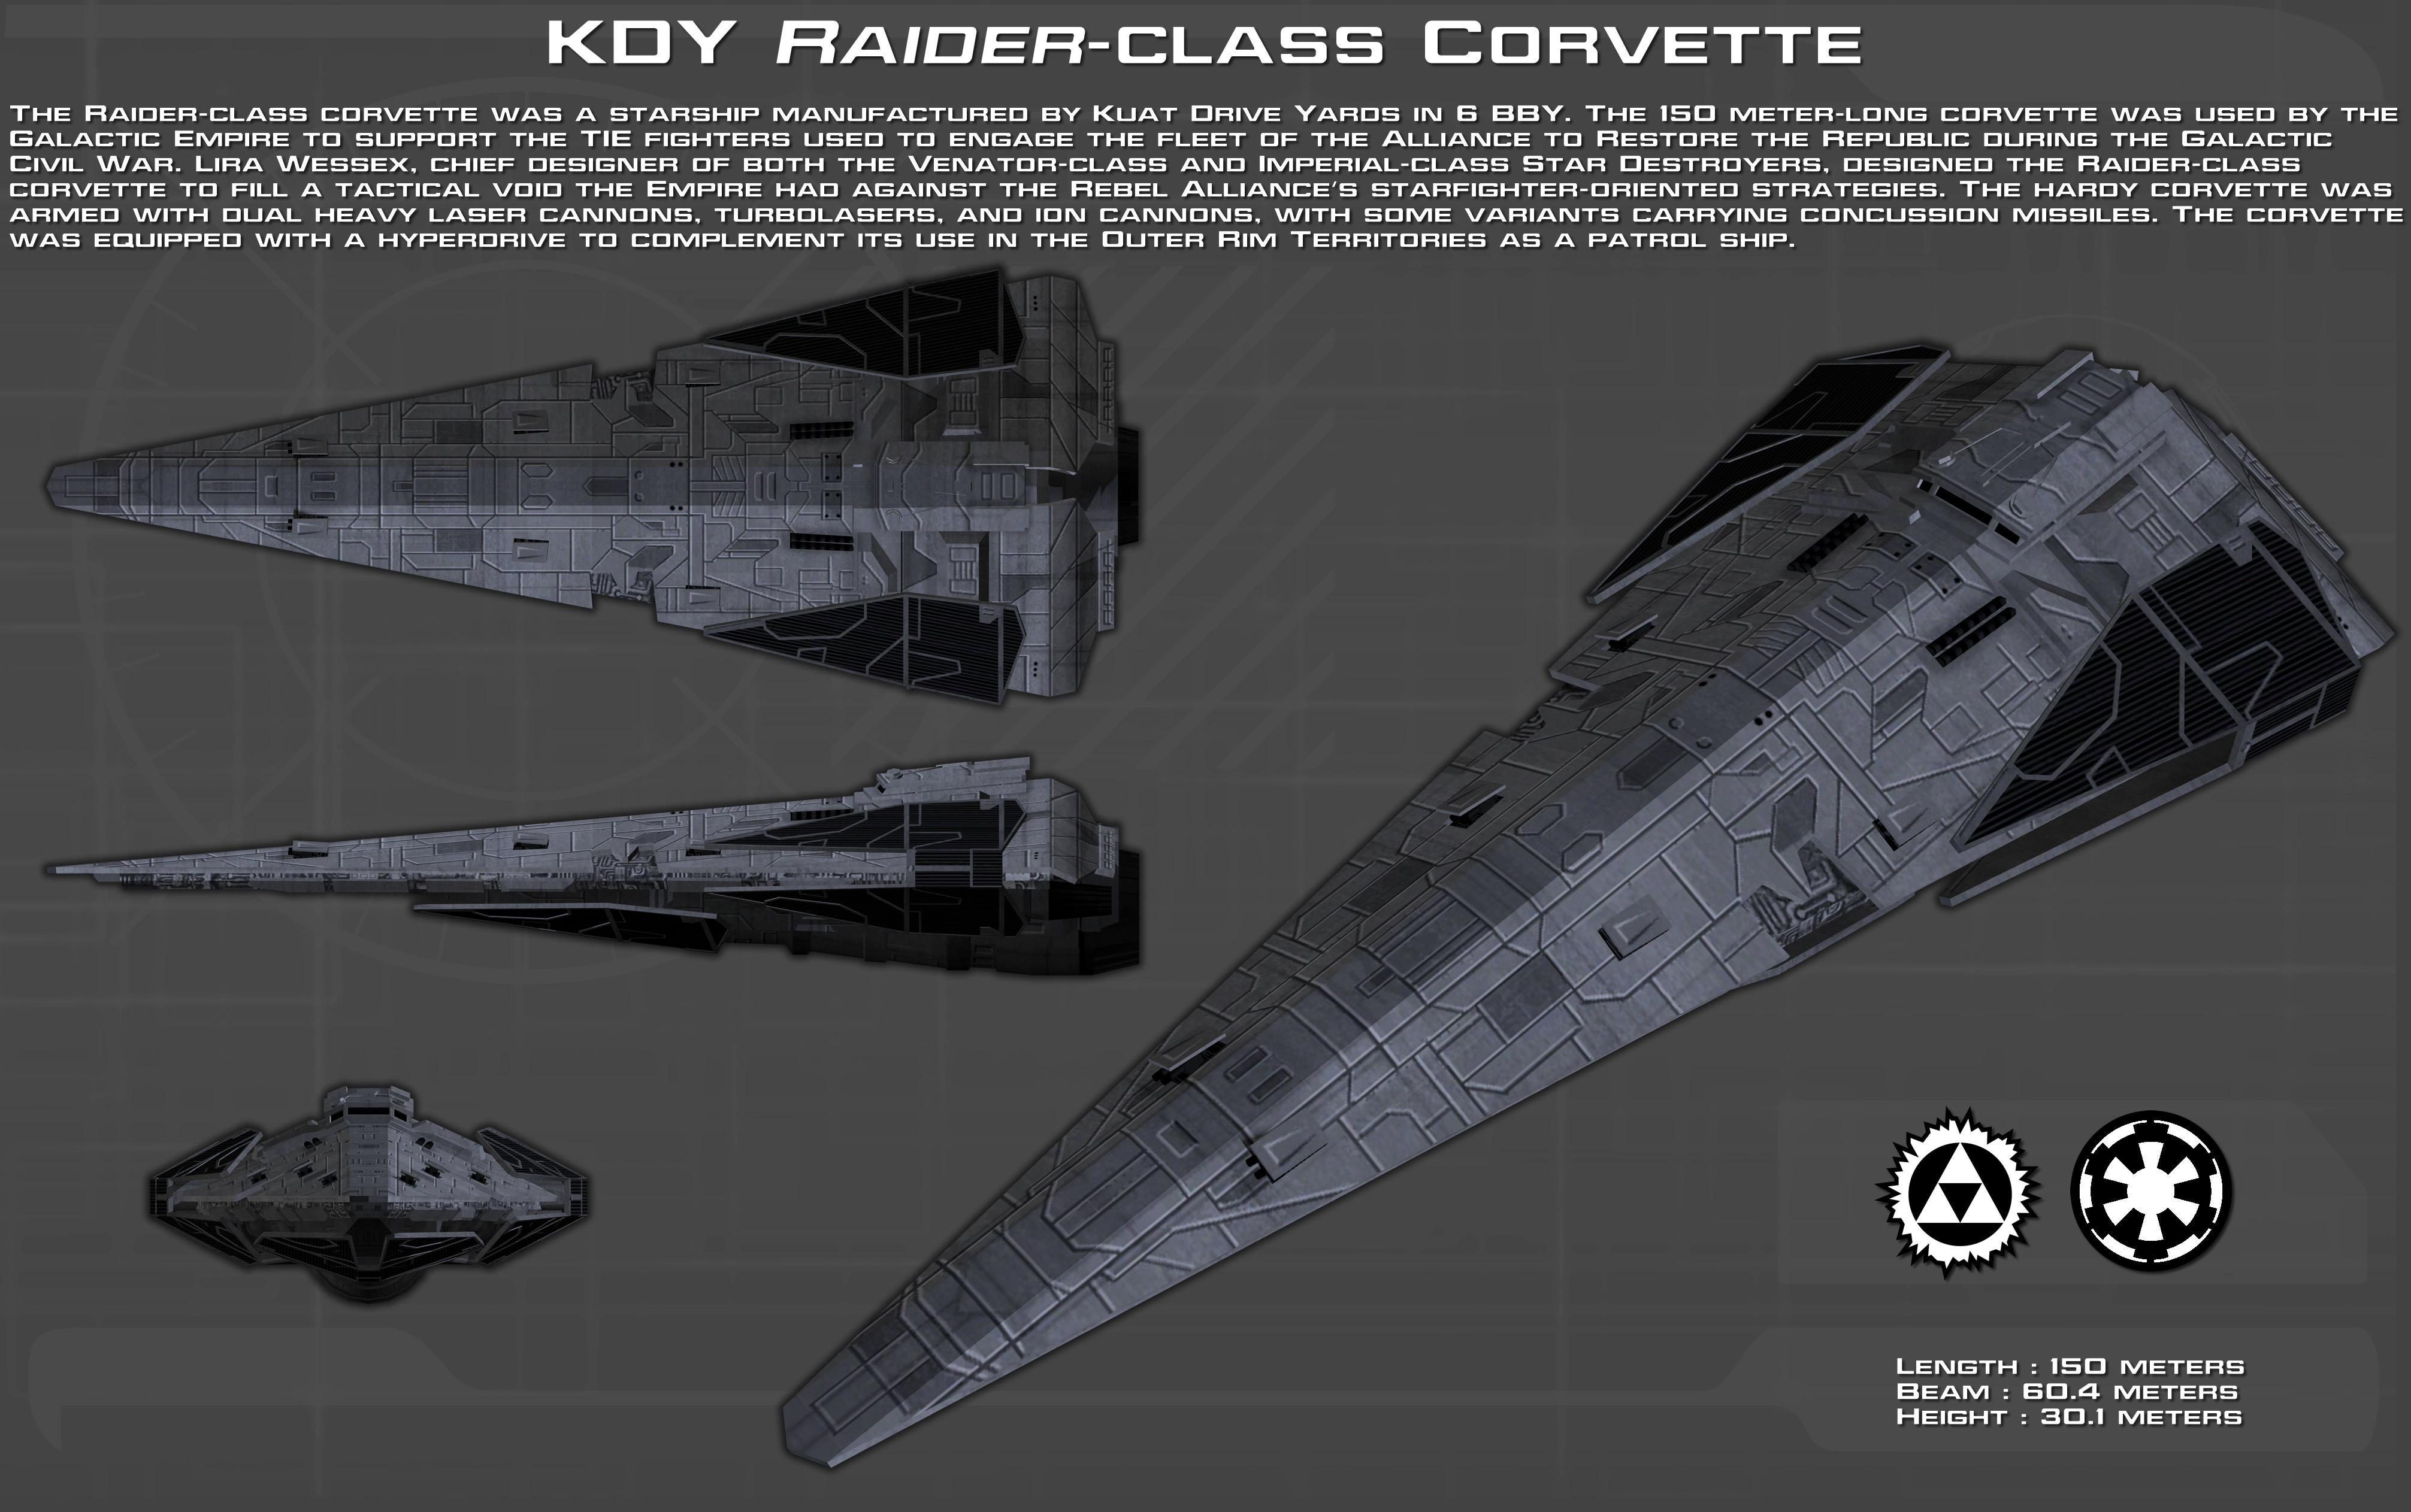 KDY Raider-class Corvette ortho [New] by unusualsuspex